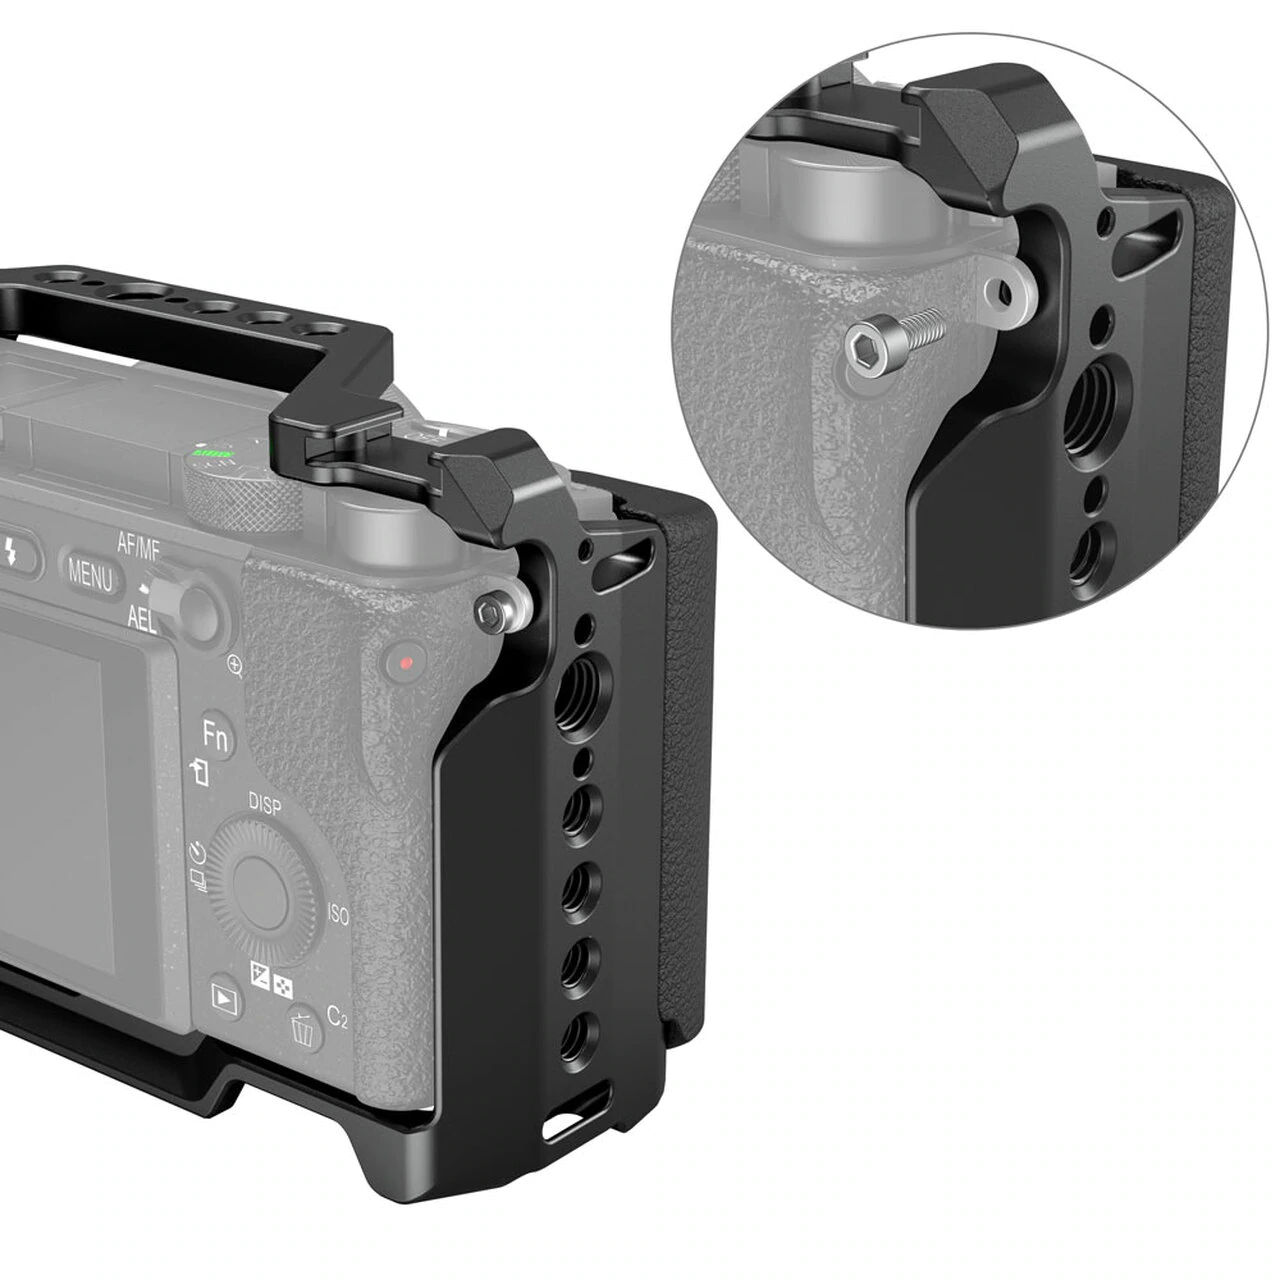 smallrig-3164-07-sony-a6-camera-cage-silicone-grip-klatka-z-gripem.jpg